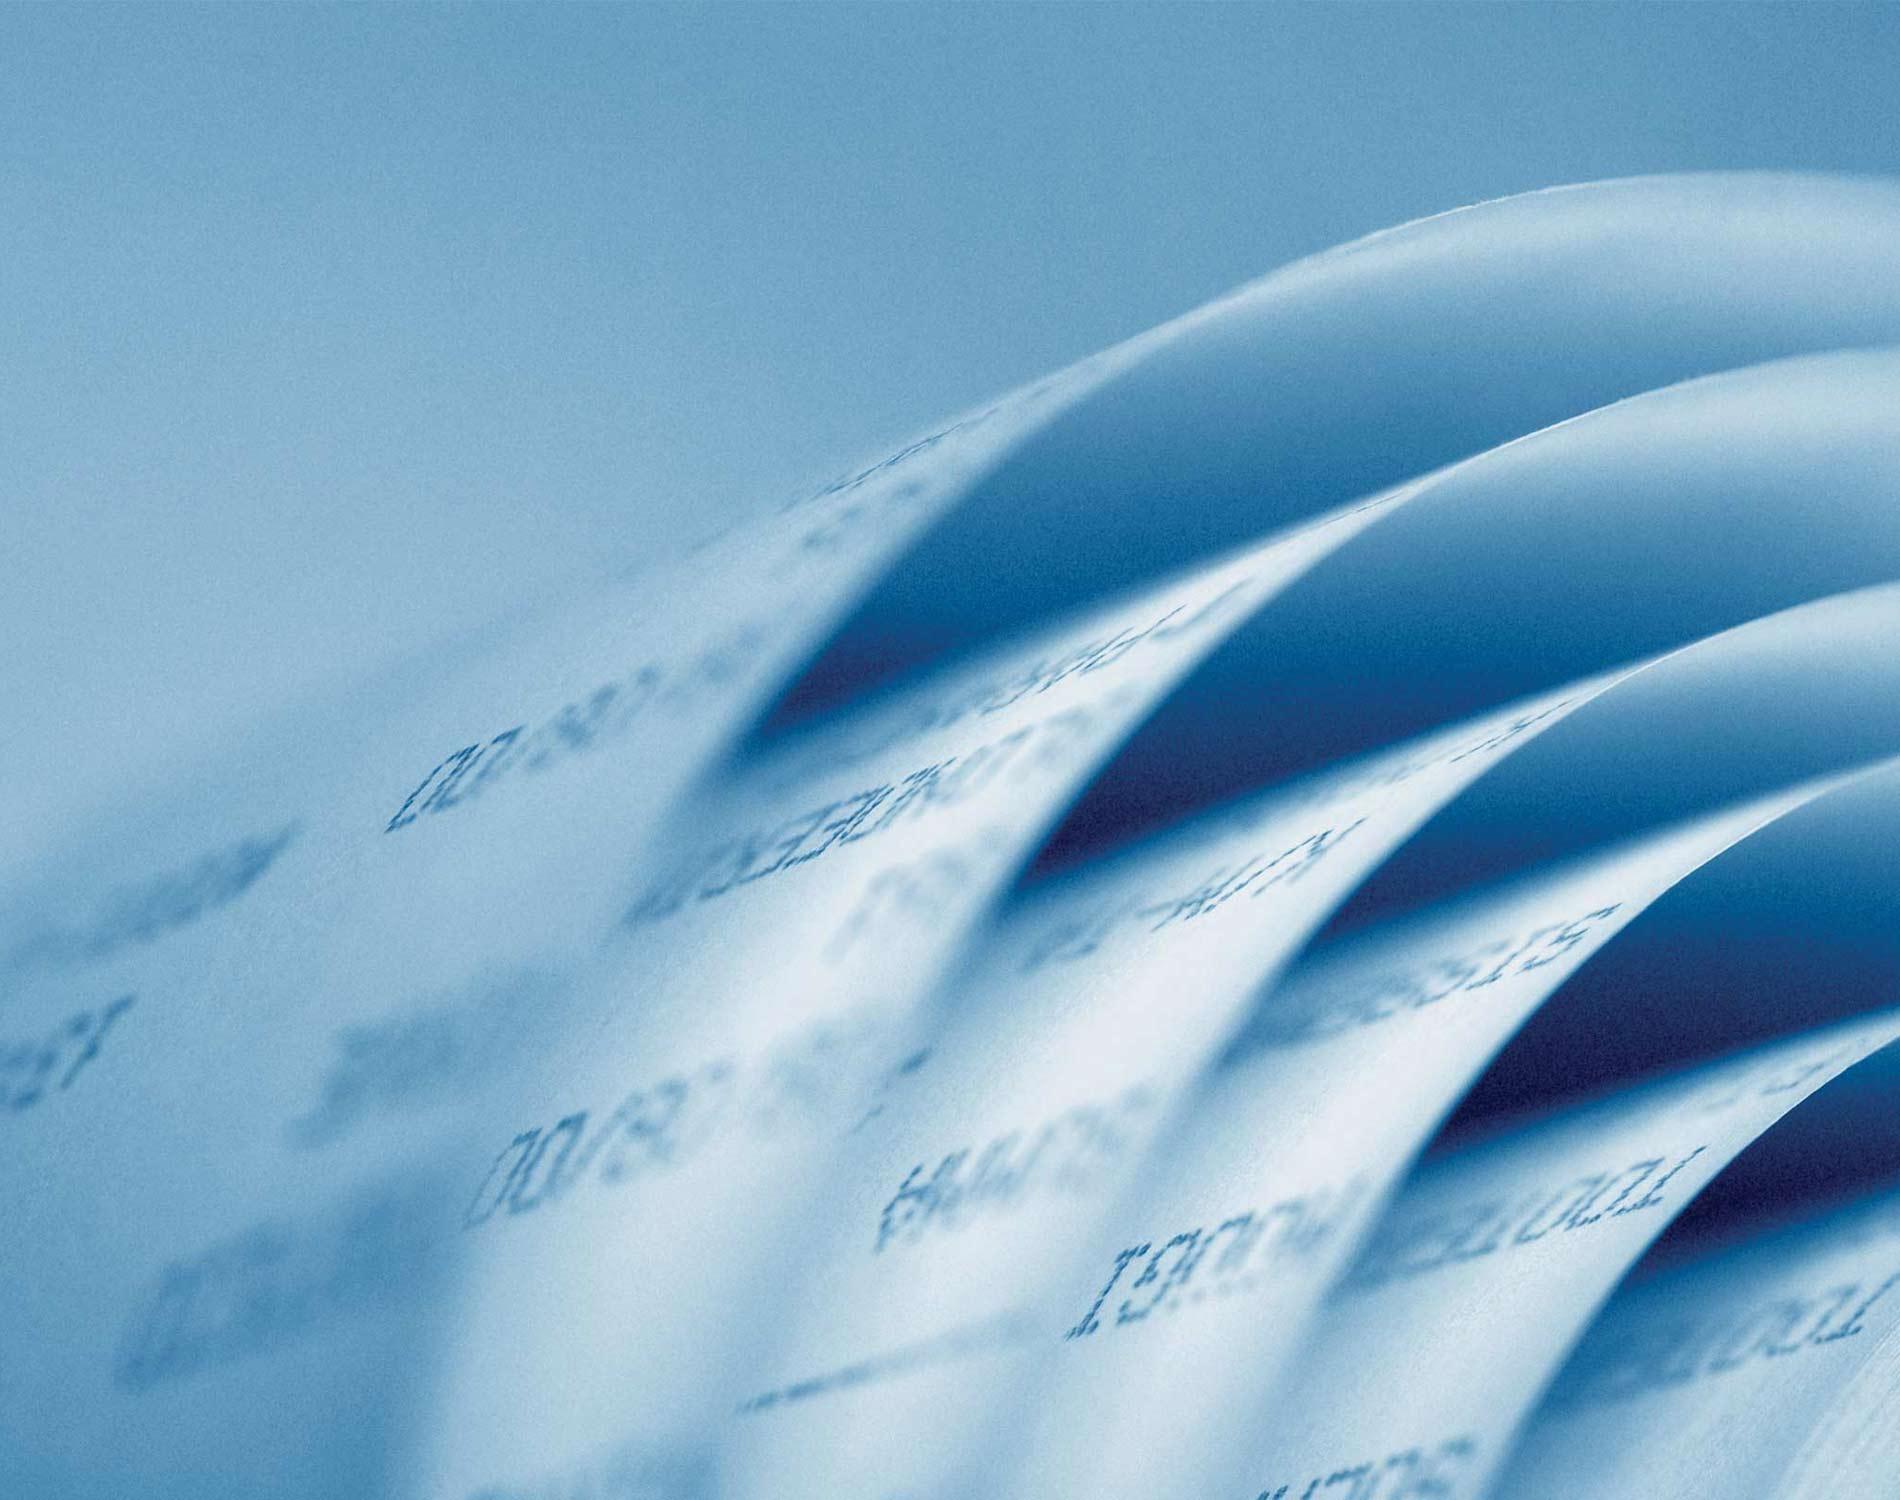 Podatek od towarów i usług (Podatek VAT cz. I)